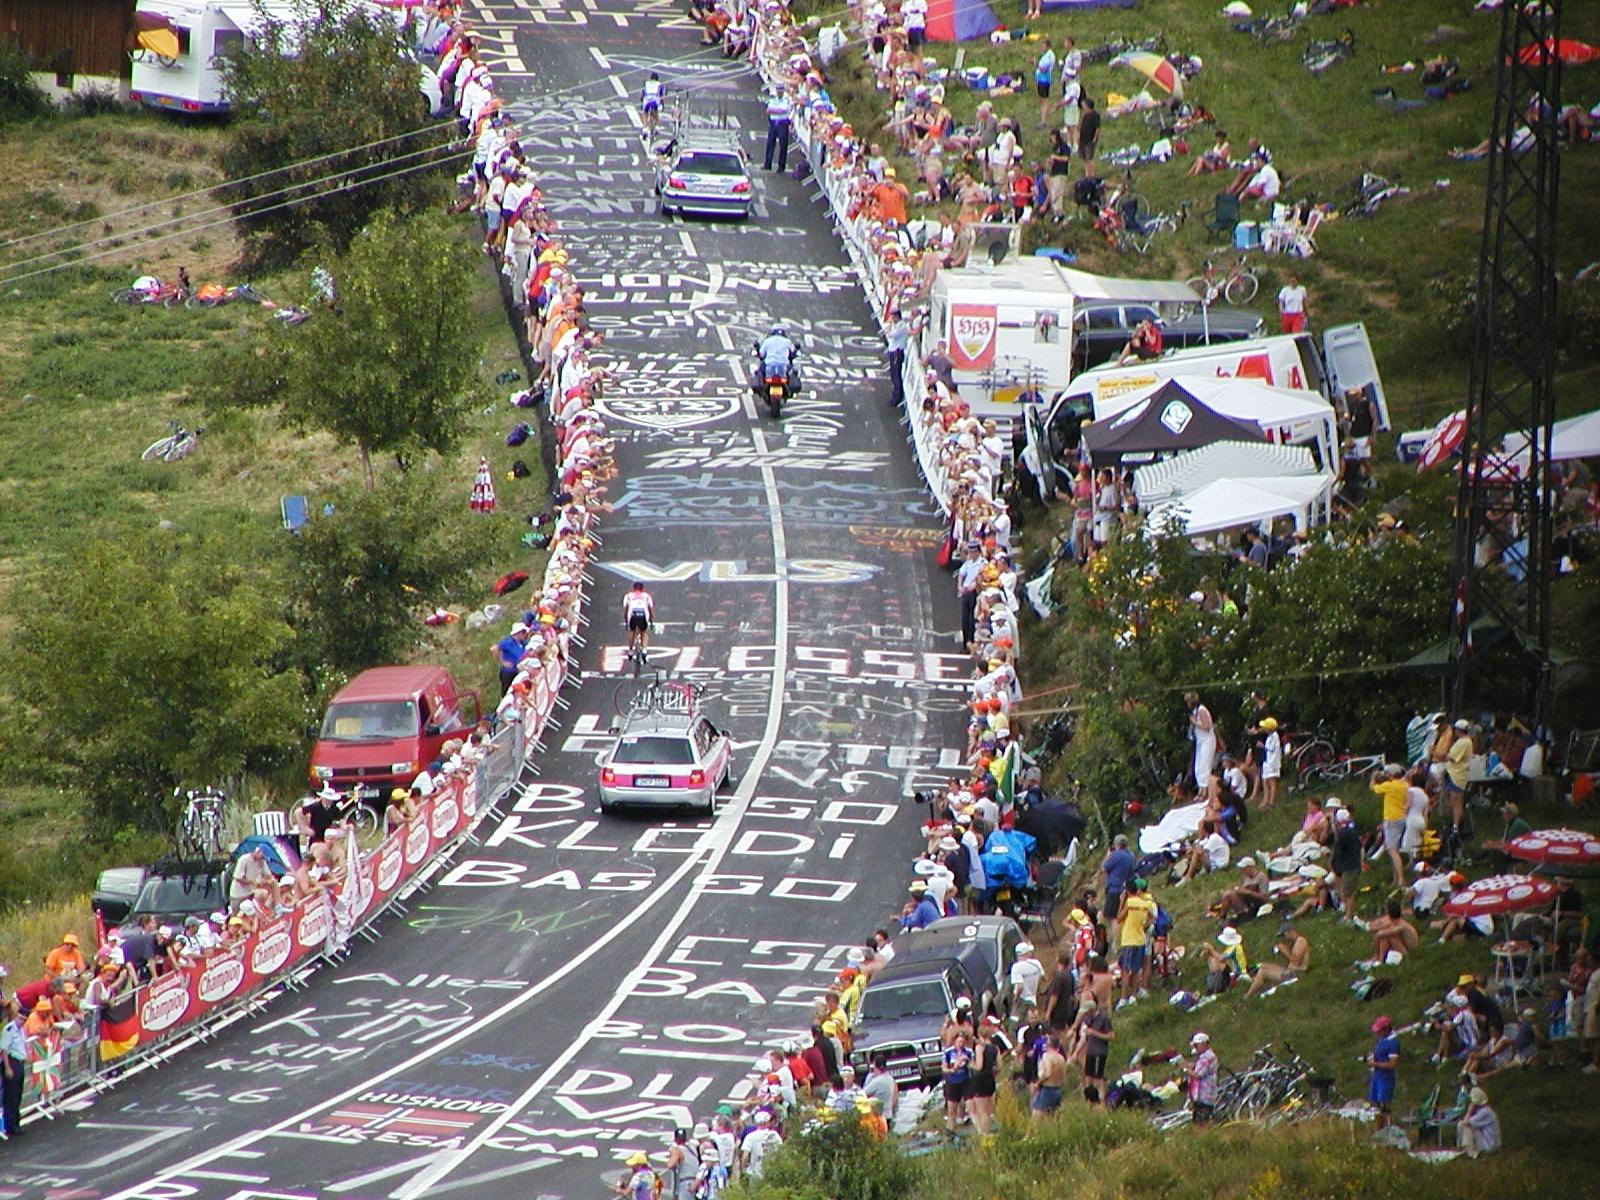 What it's like to bike up Alpe d' Huez, Pee Oui tells all ...